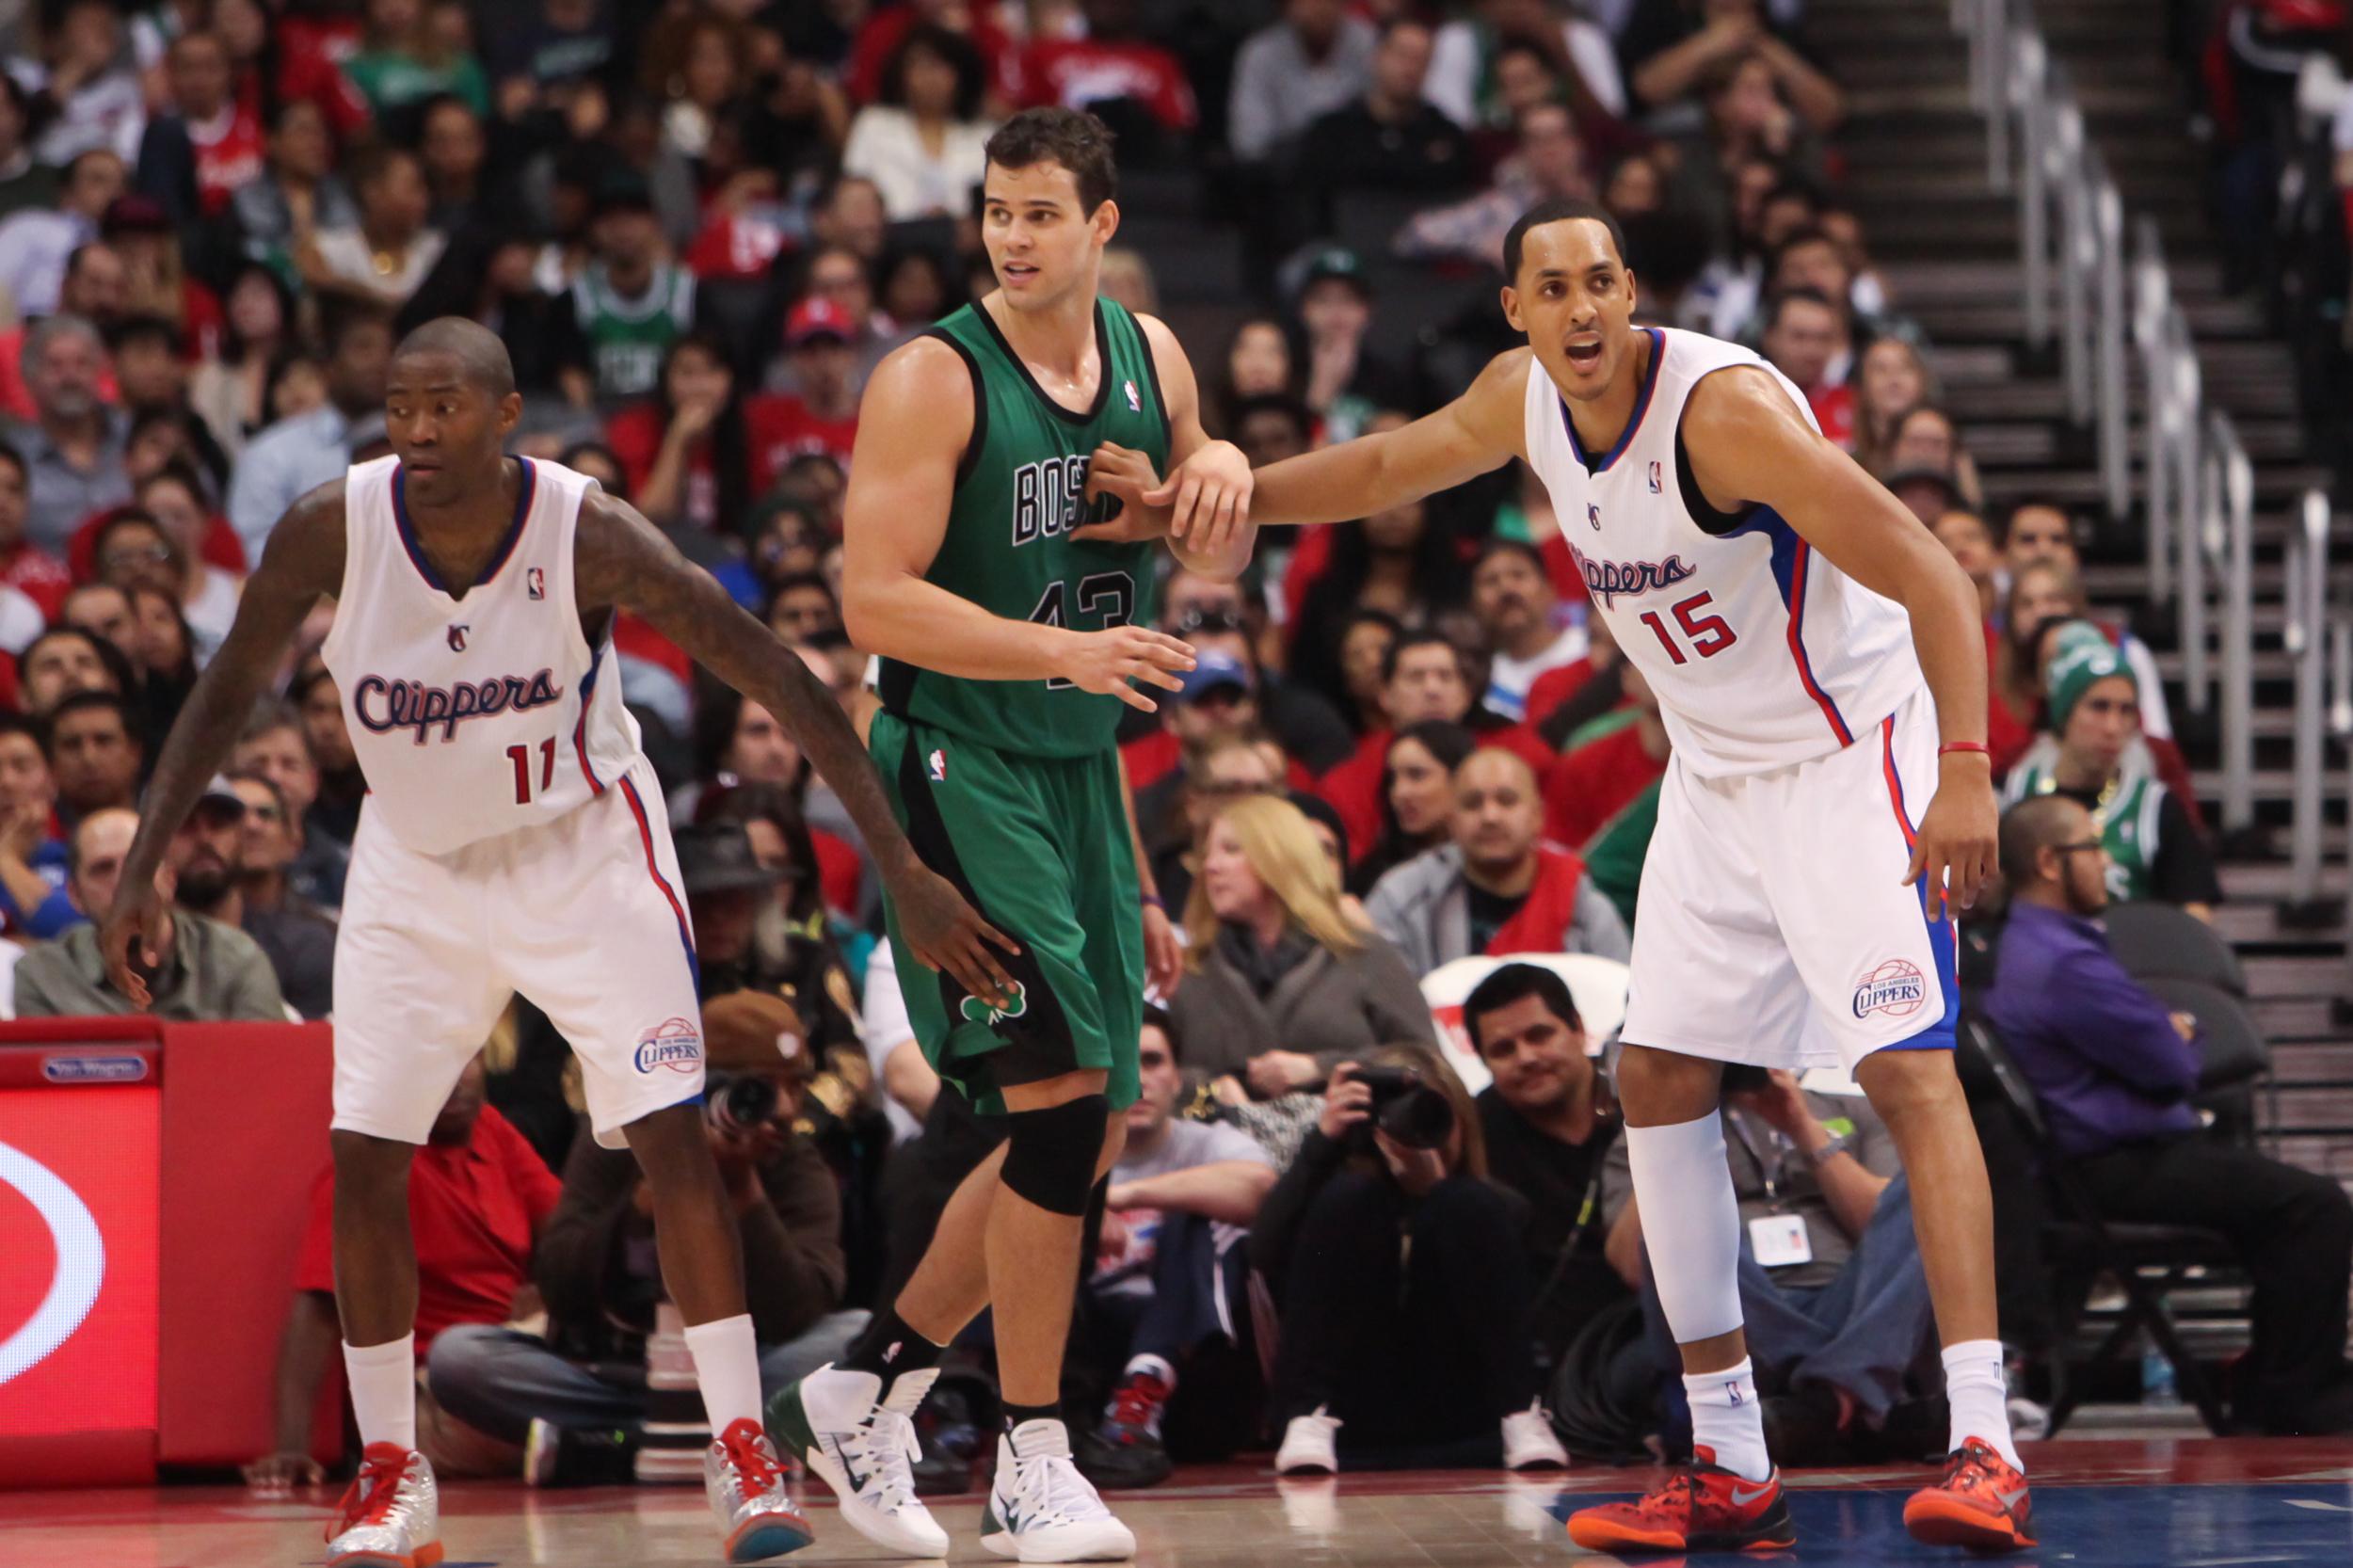 Photo by Varon P. Celtics-61.jpg